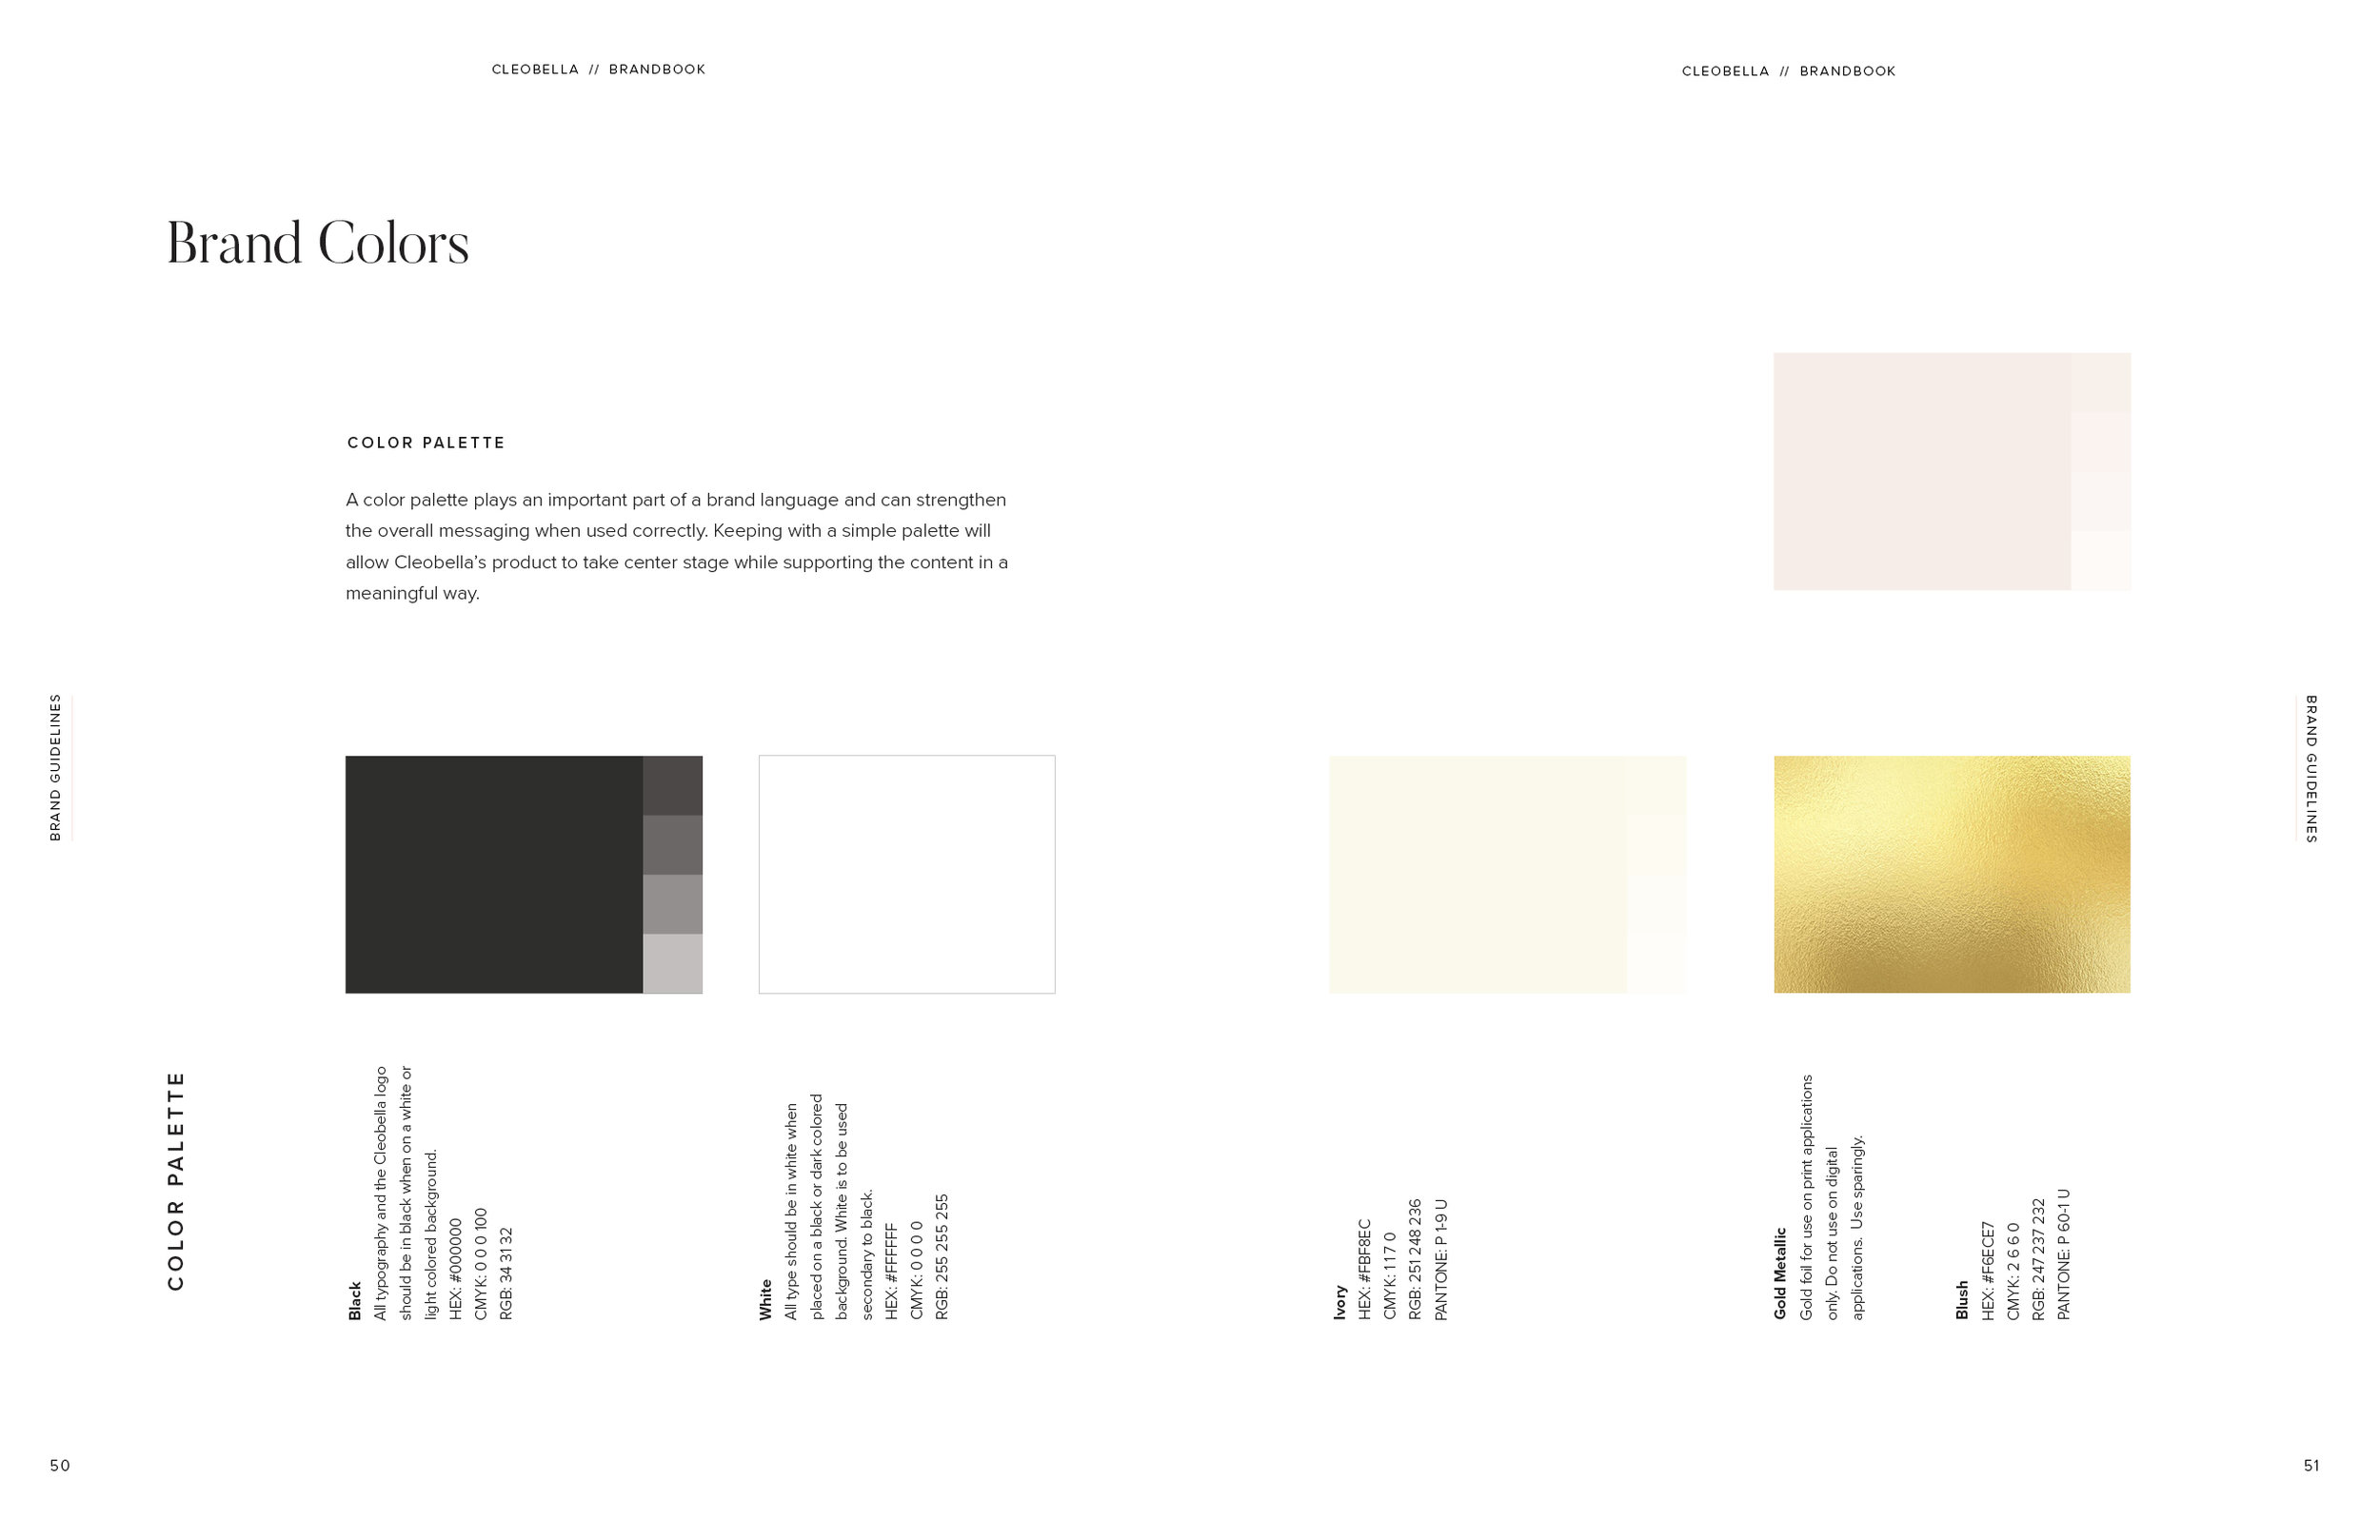 Cleobella Brand Book R226.jpg